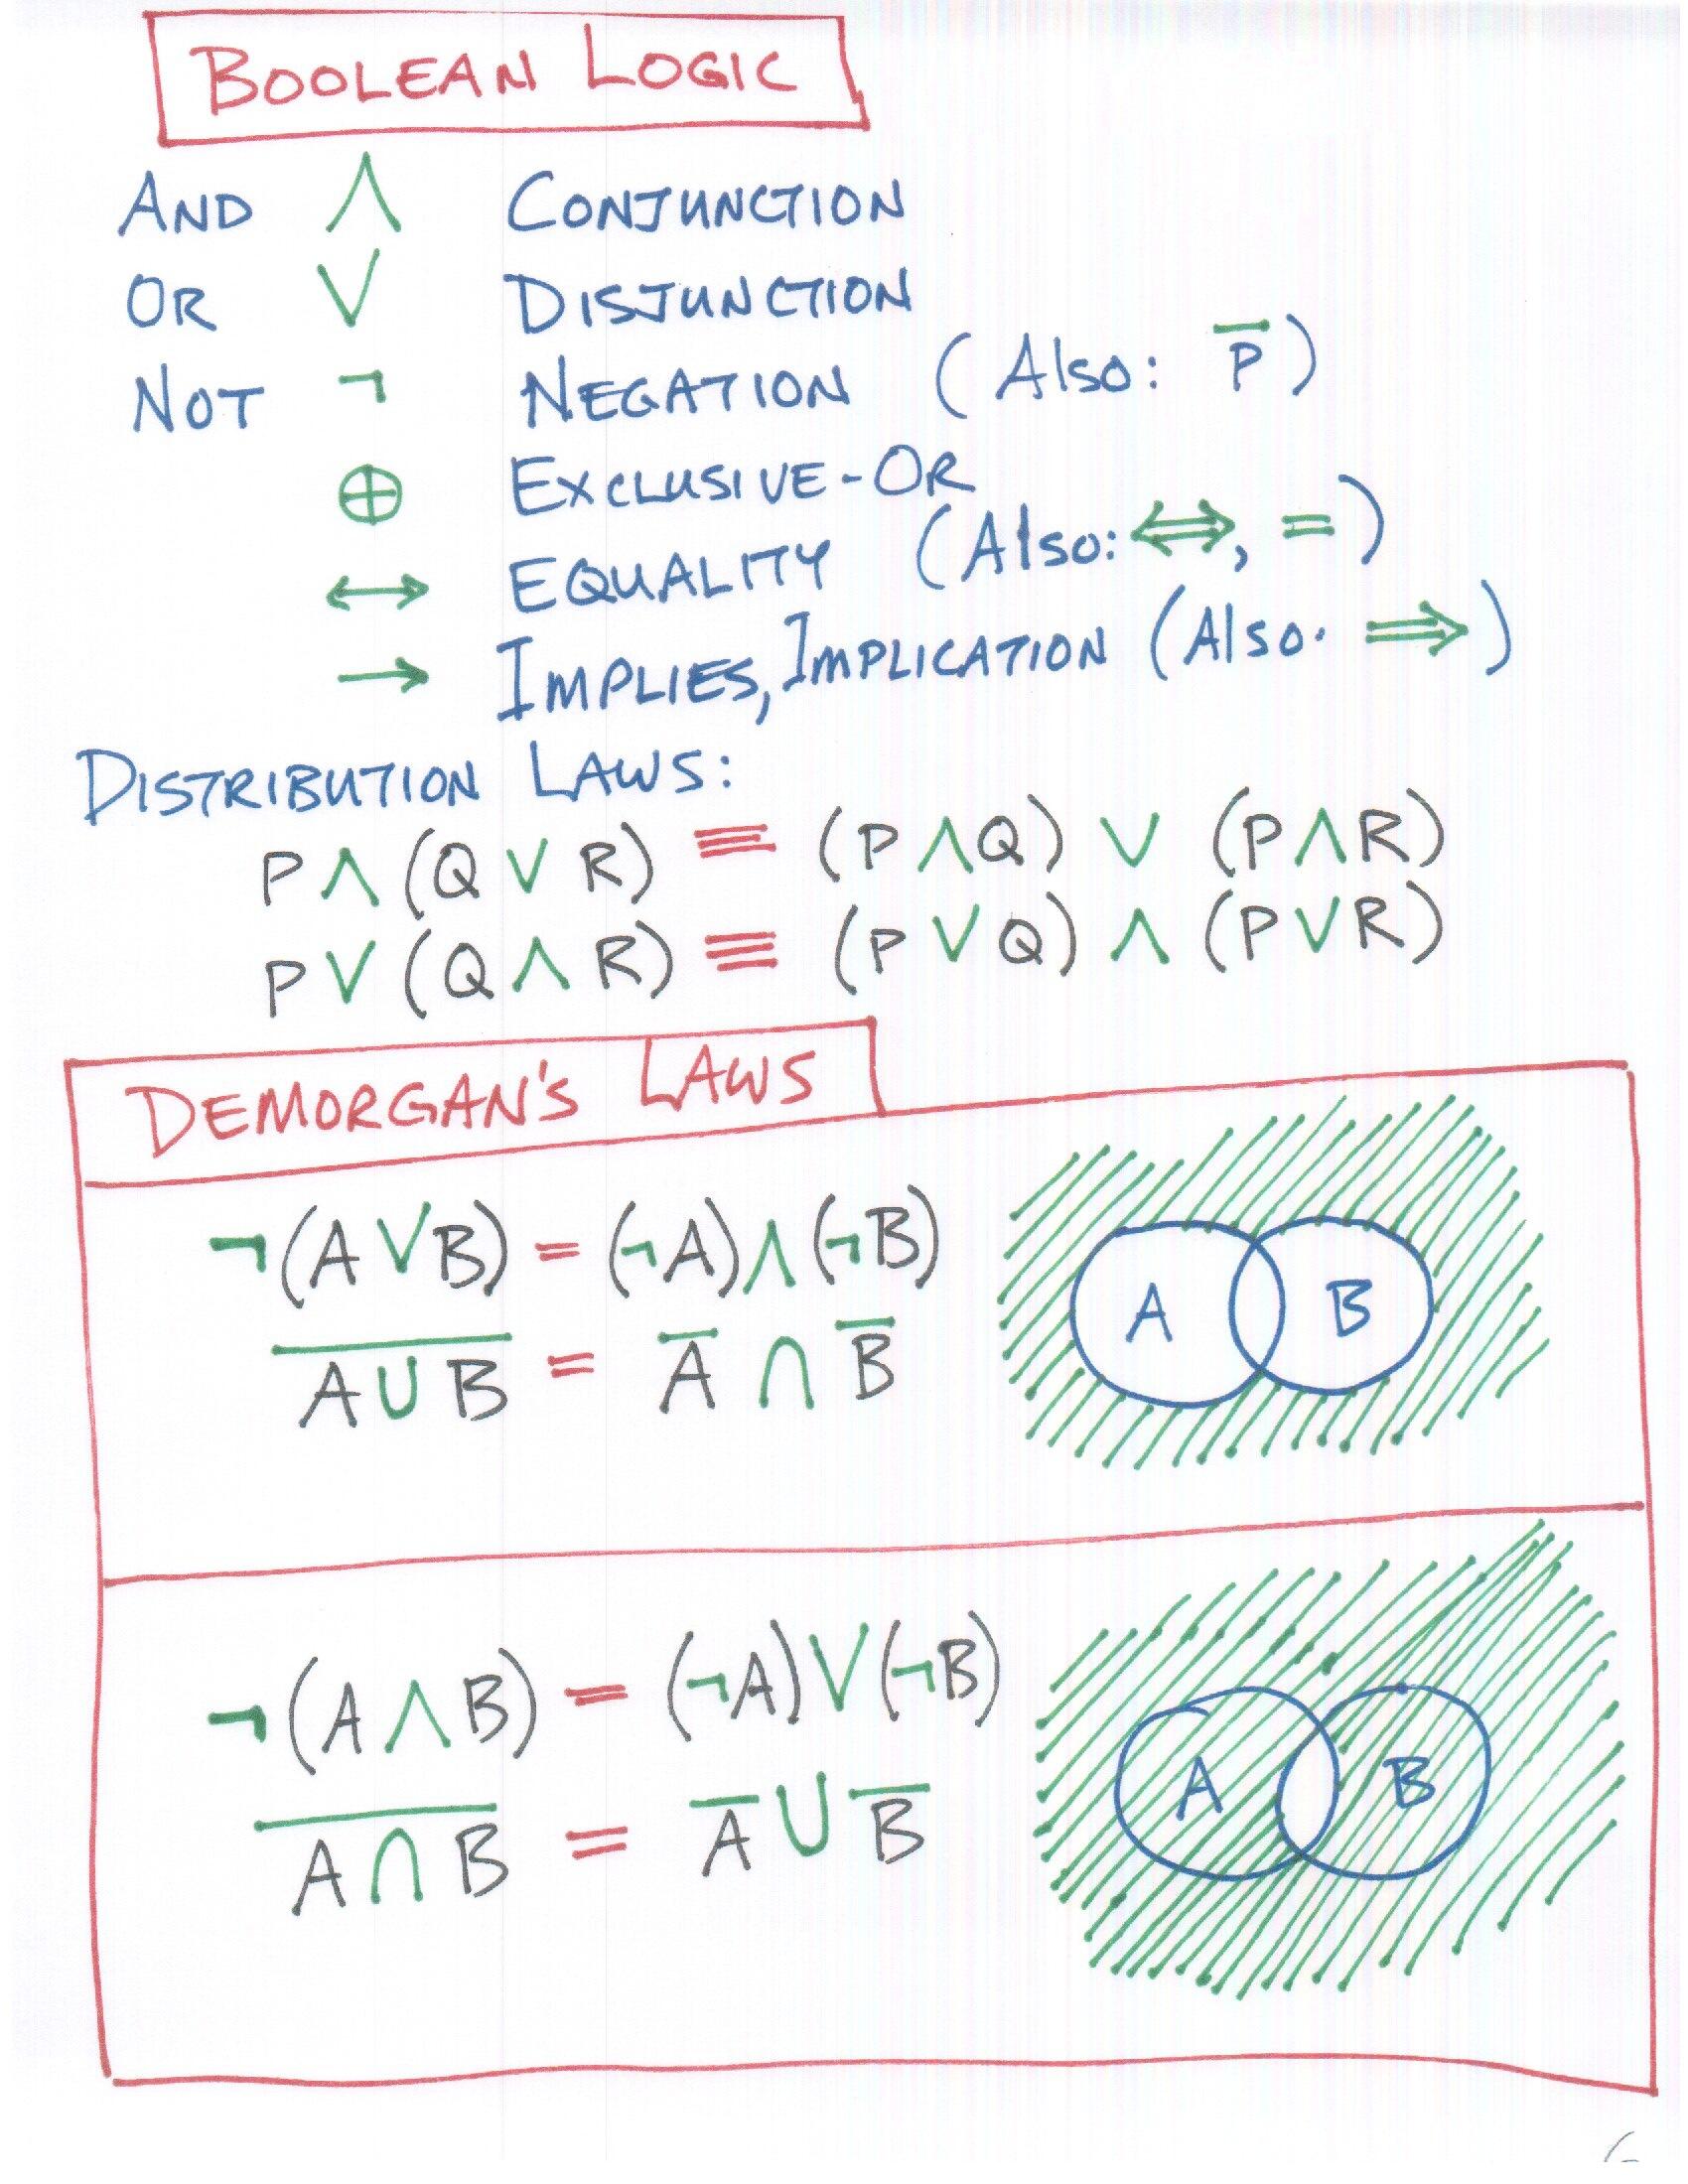 http://web.cecs.pdx.edu/~harry/TheoryOfComp/slides/chapter0/slide%205.jpeg